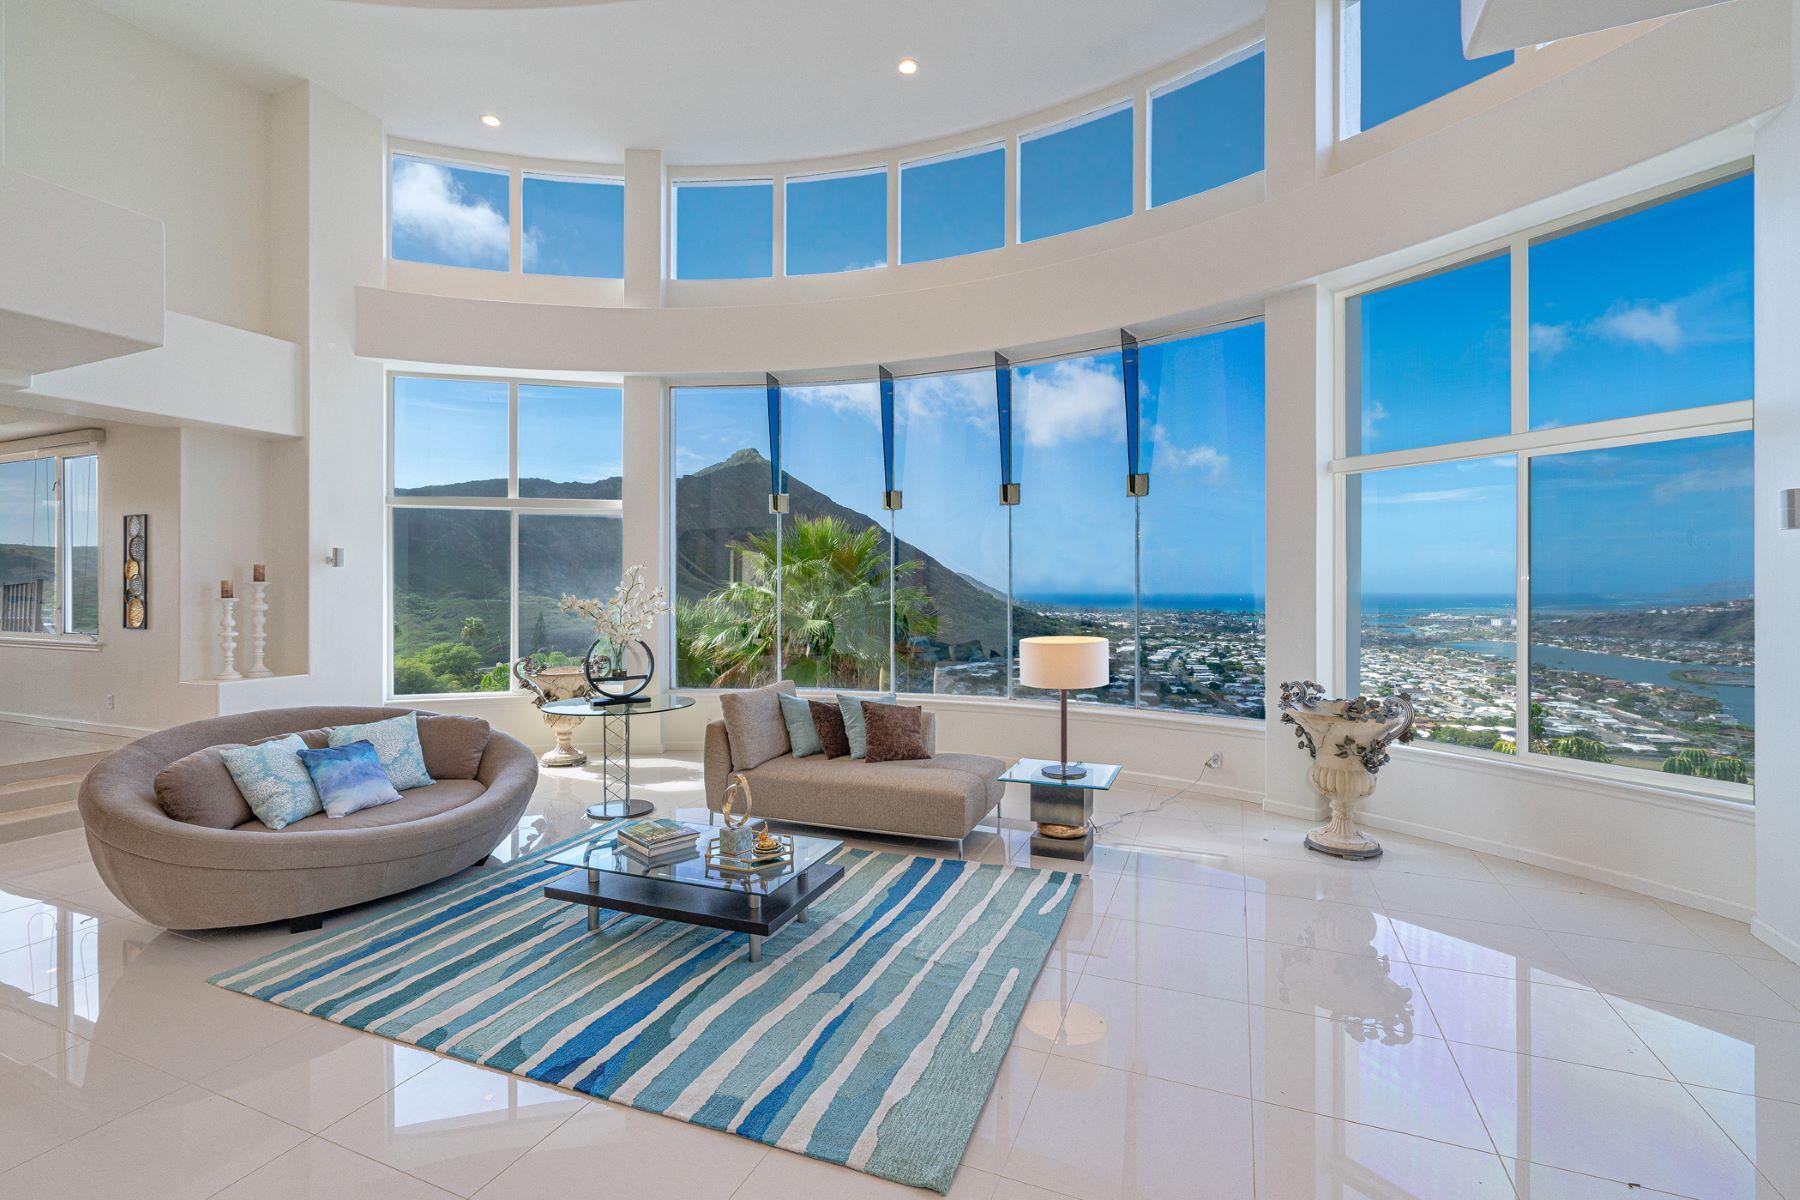 Single Family Homes 为 销售 在 Single Family Home, Hawaii Kai, Diamond Head Views, Ocean Views 114 Hanohano Place 火奴鲁鲁, 夏威夷 96825 美国